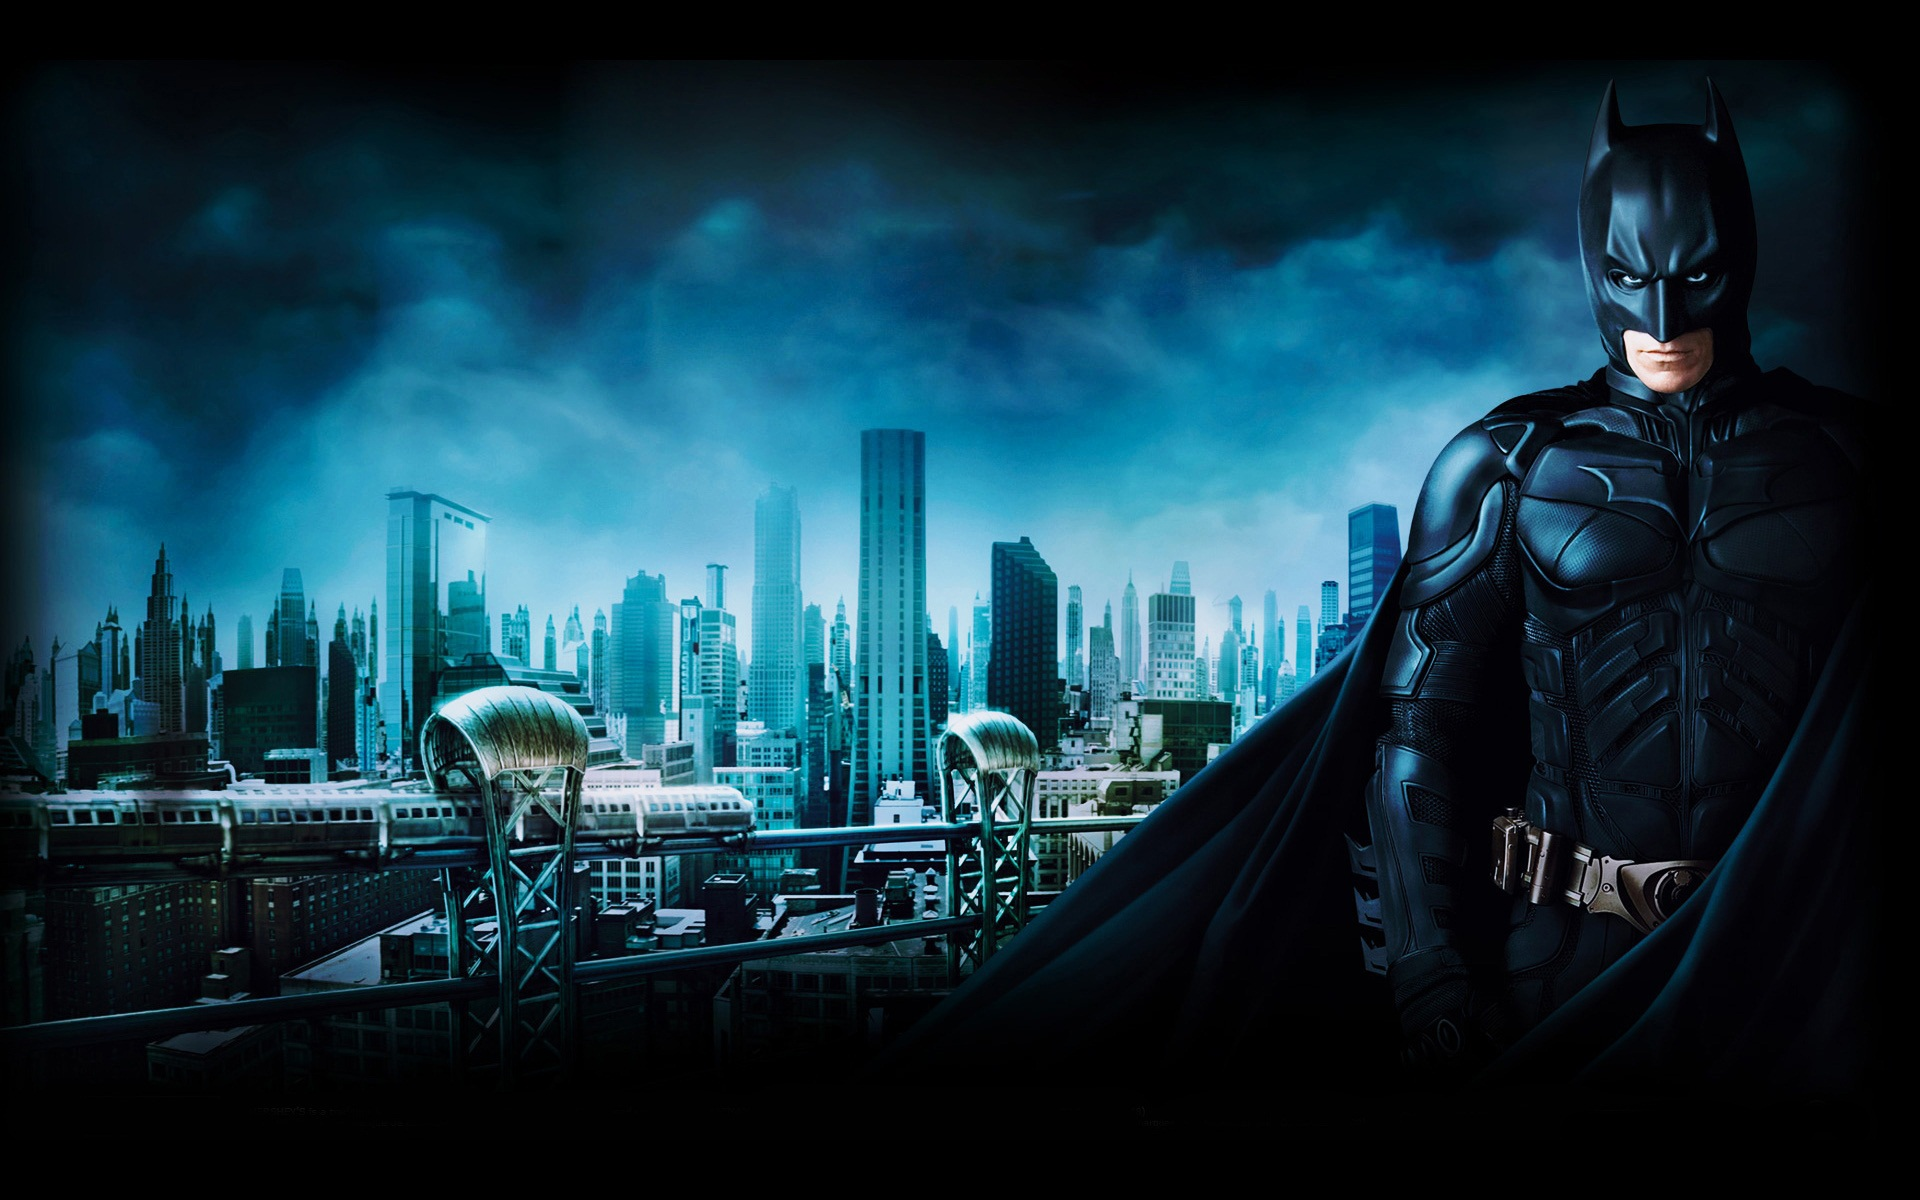 Batman Wallpaper HD download free | PixelsTalk Net